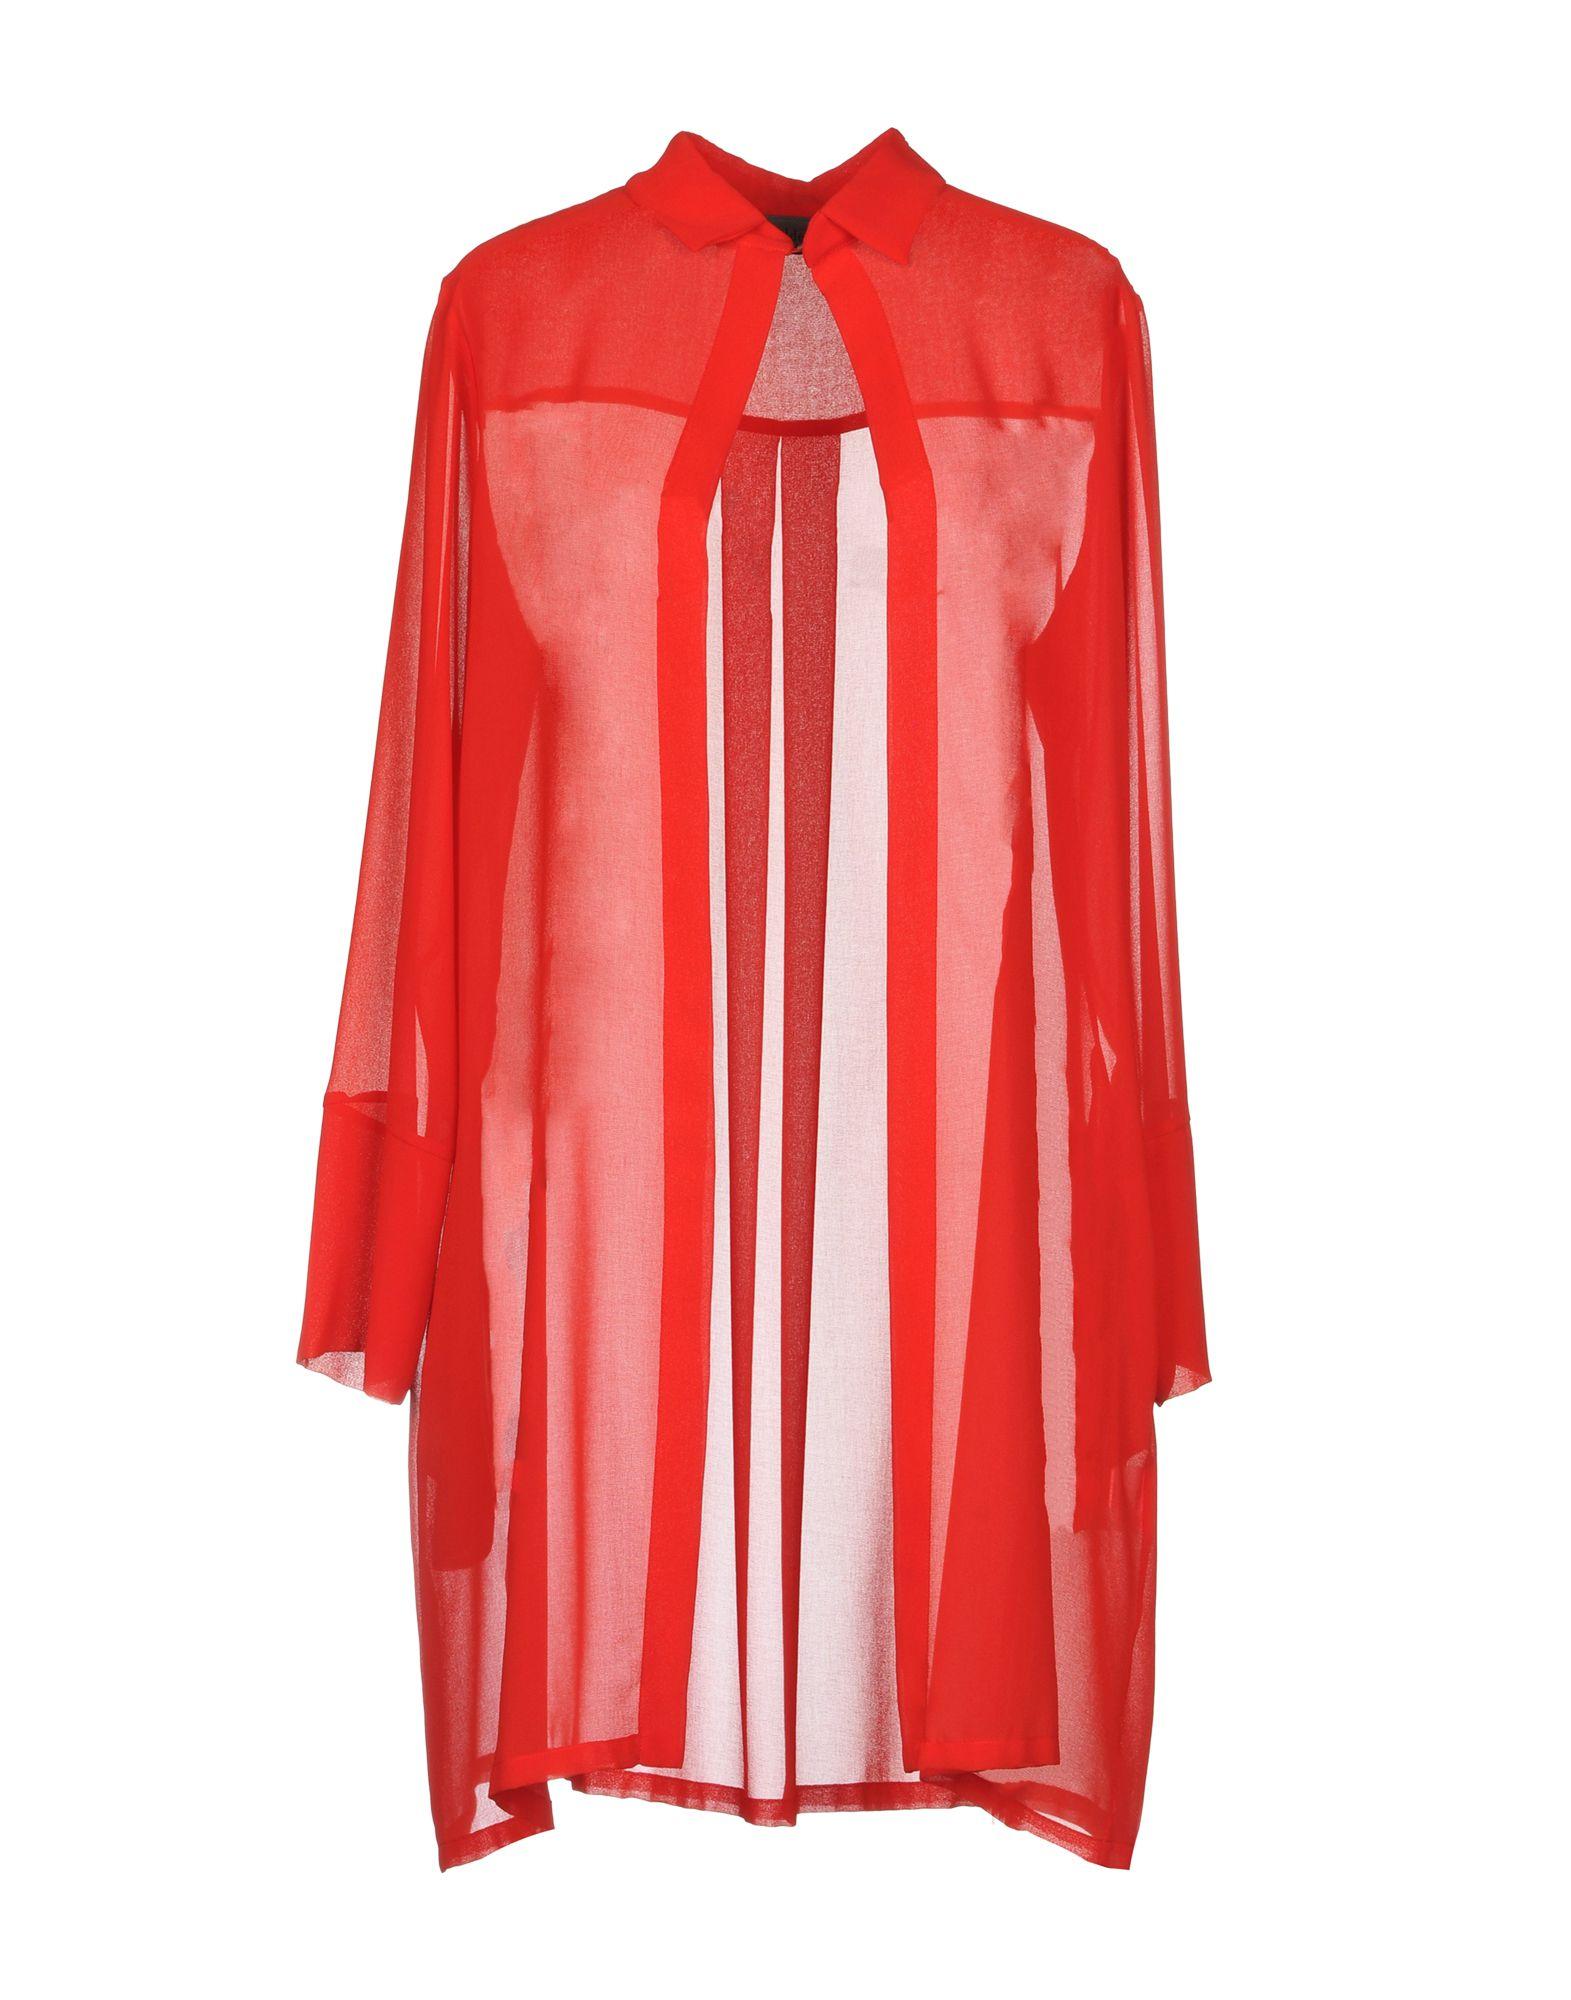 MARIA CALDERARA Solid Color Shirts & Blouses in Red